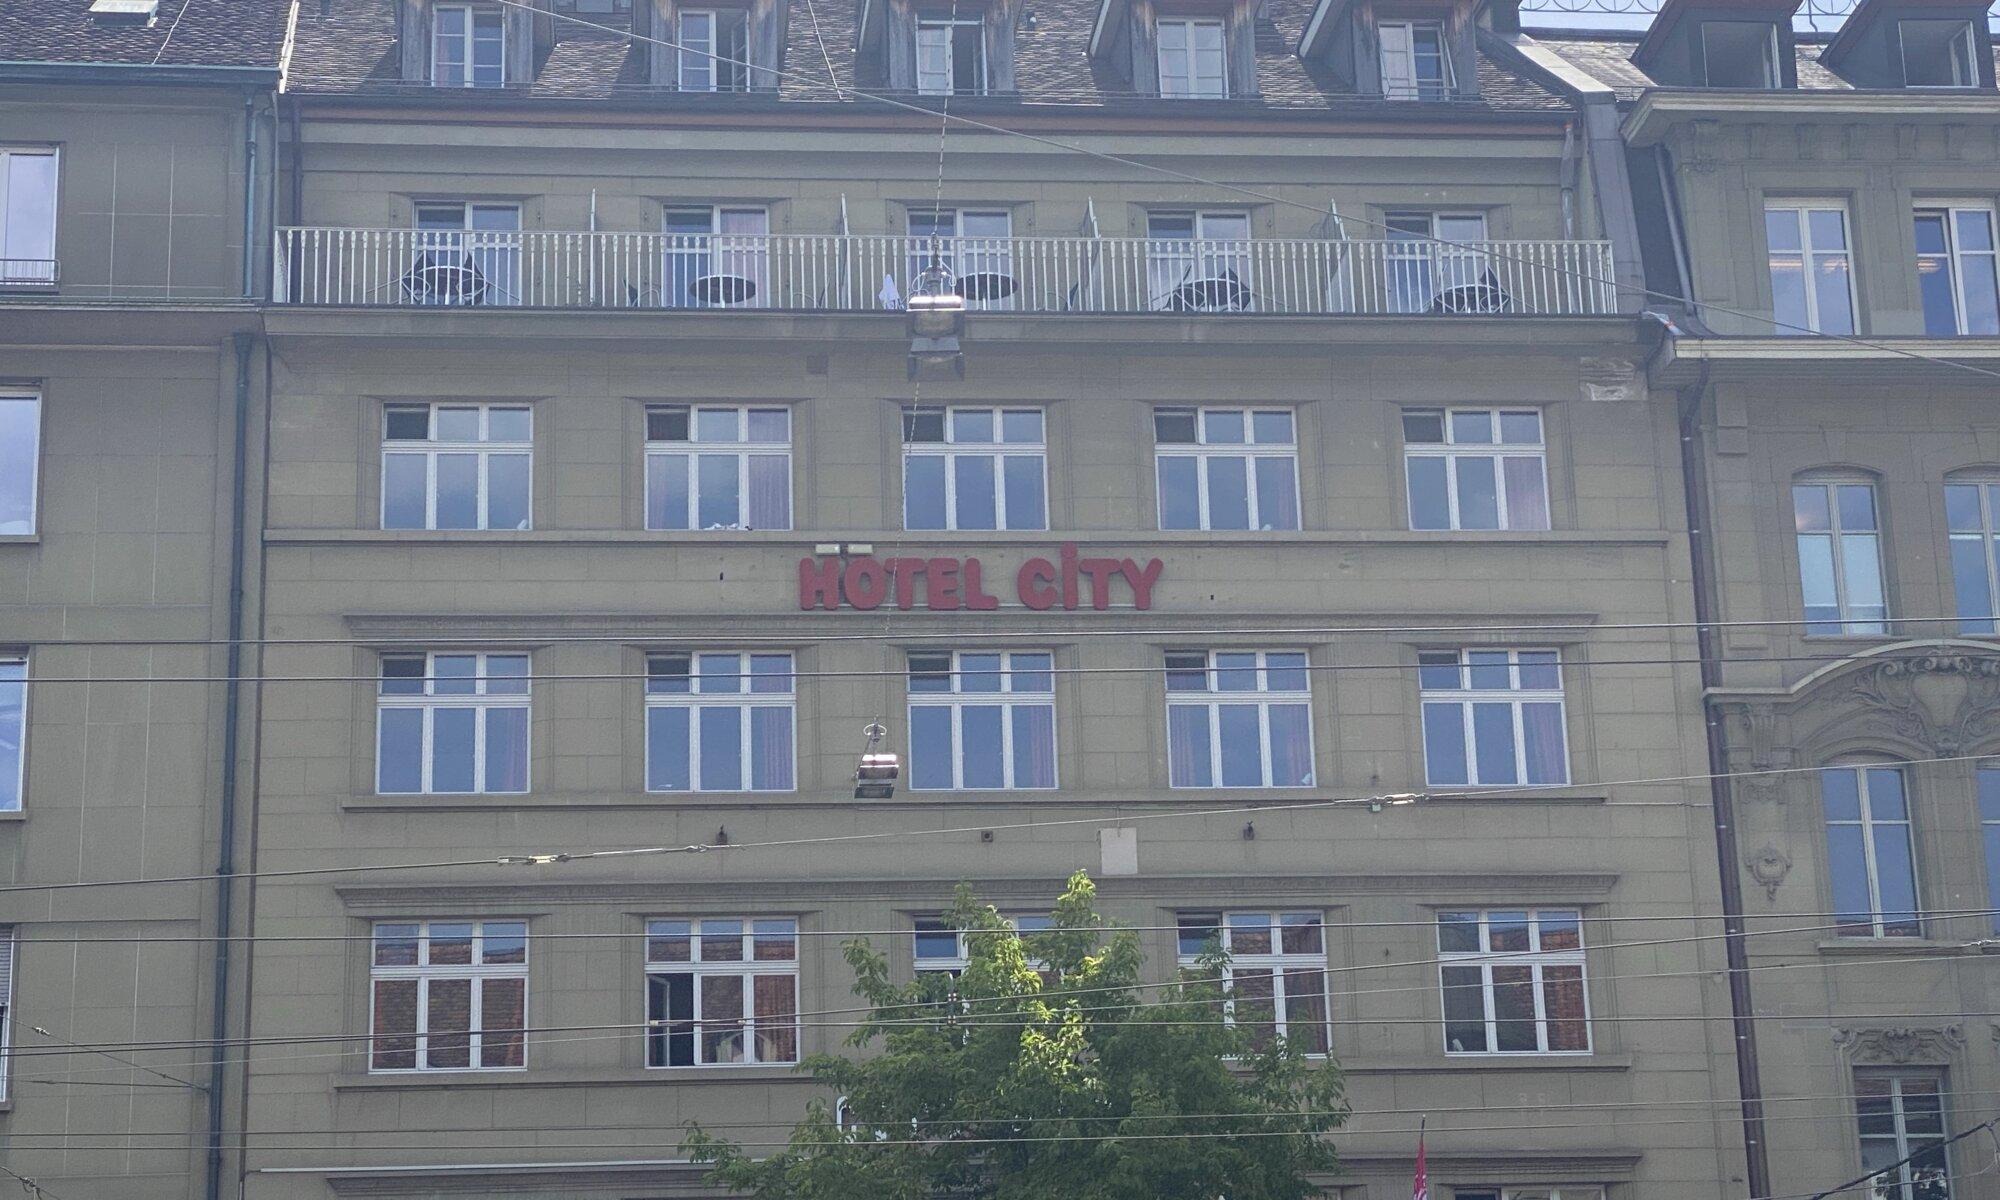 Hotel City am Bahnhof, Bern